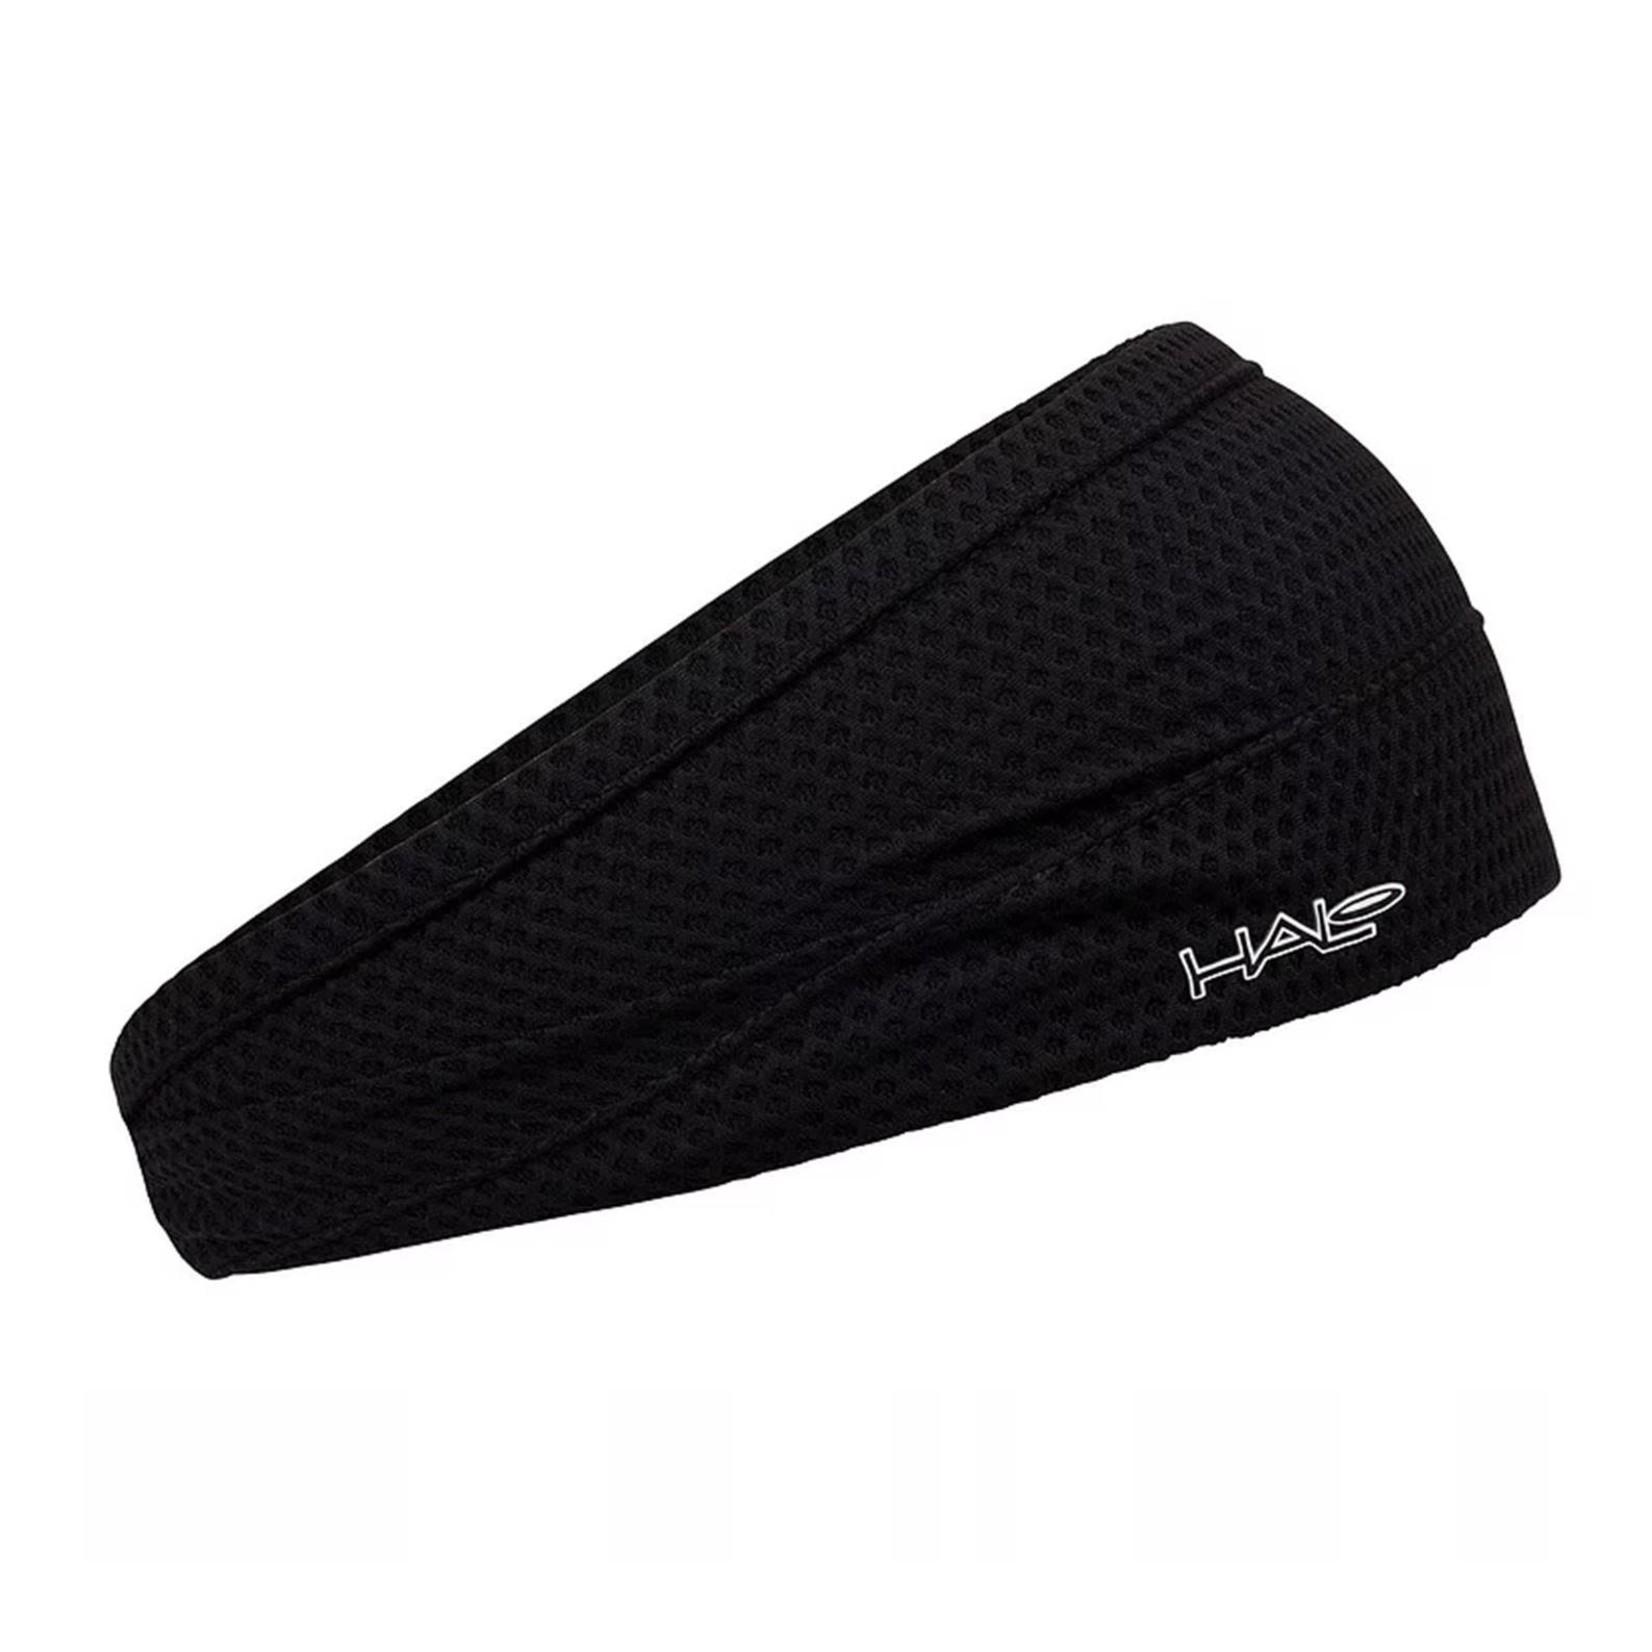 Halo Bandit Air Headband Black